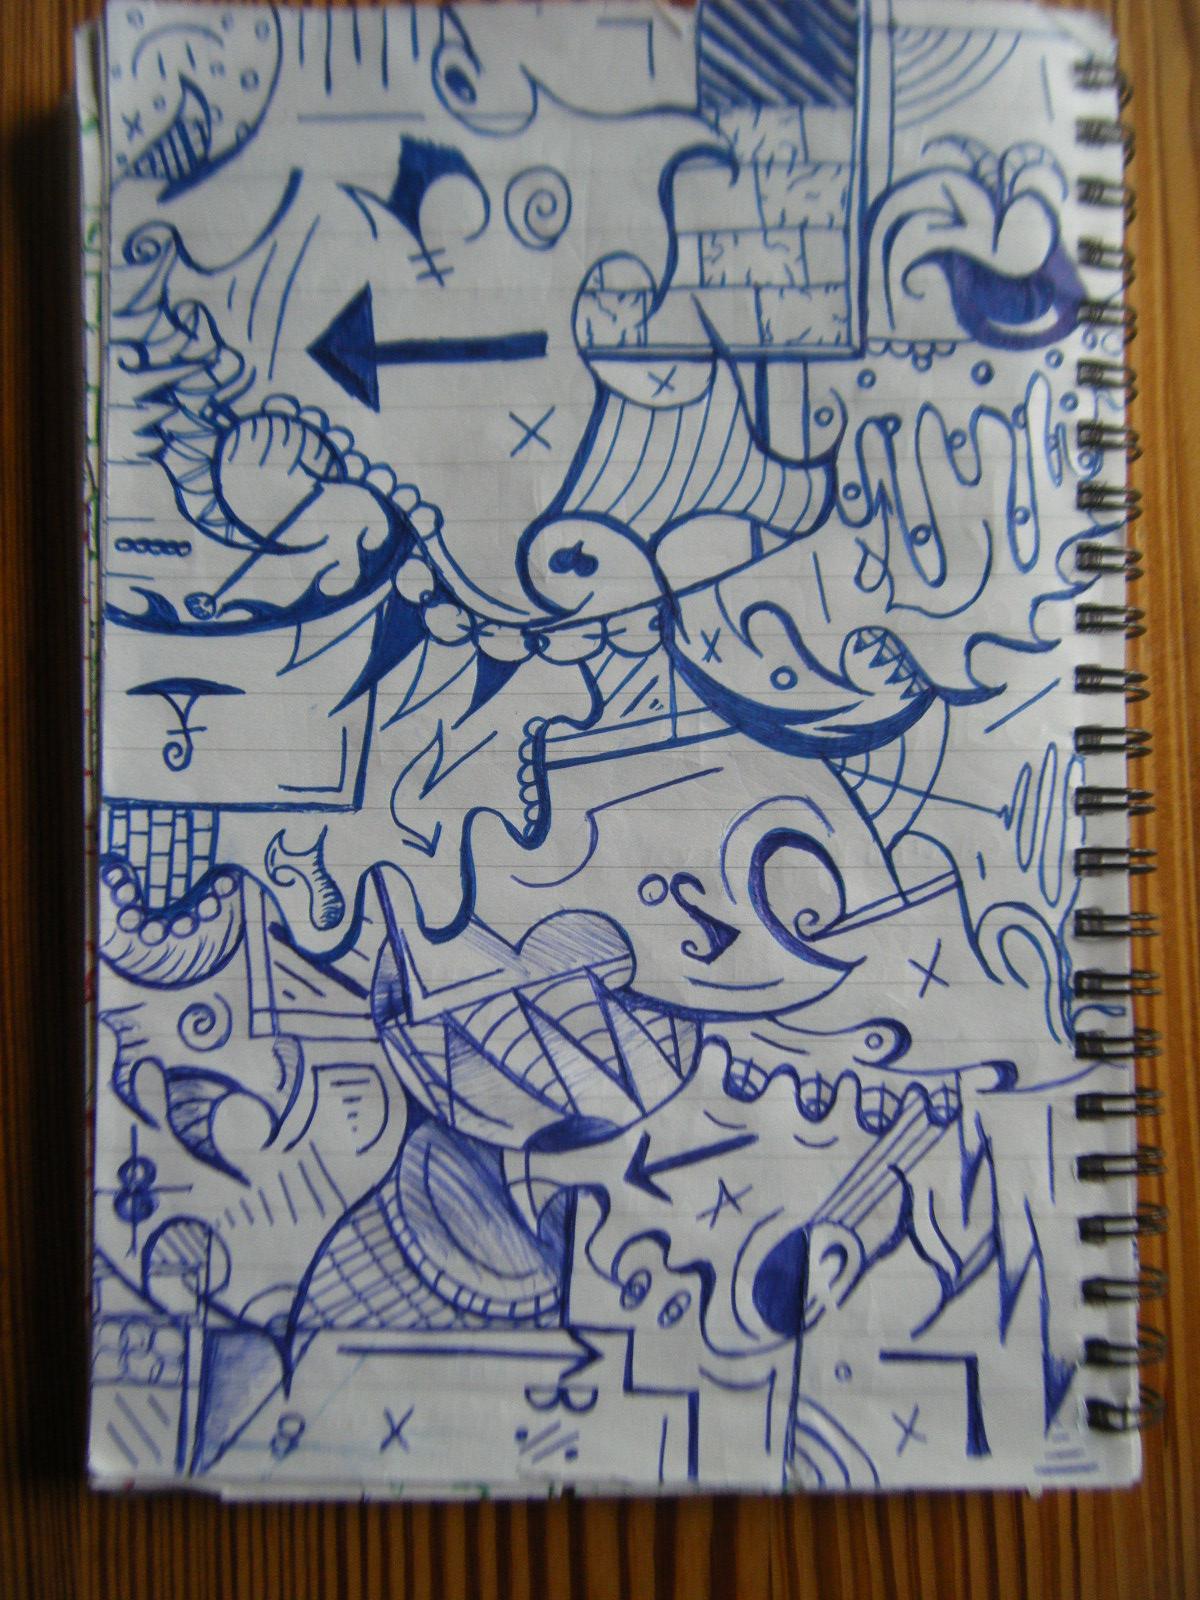 graffiti style doodles